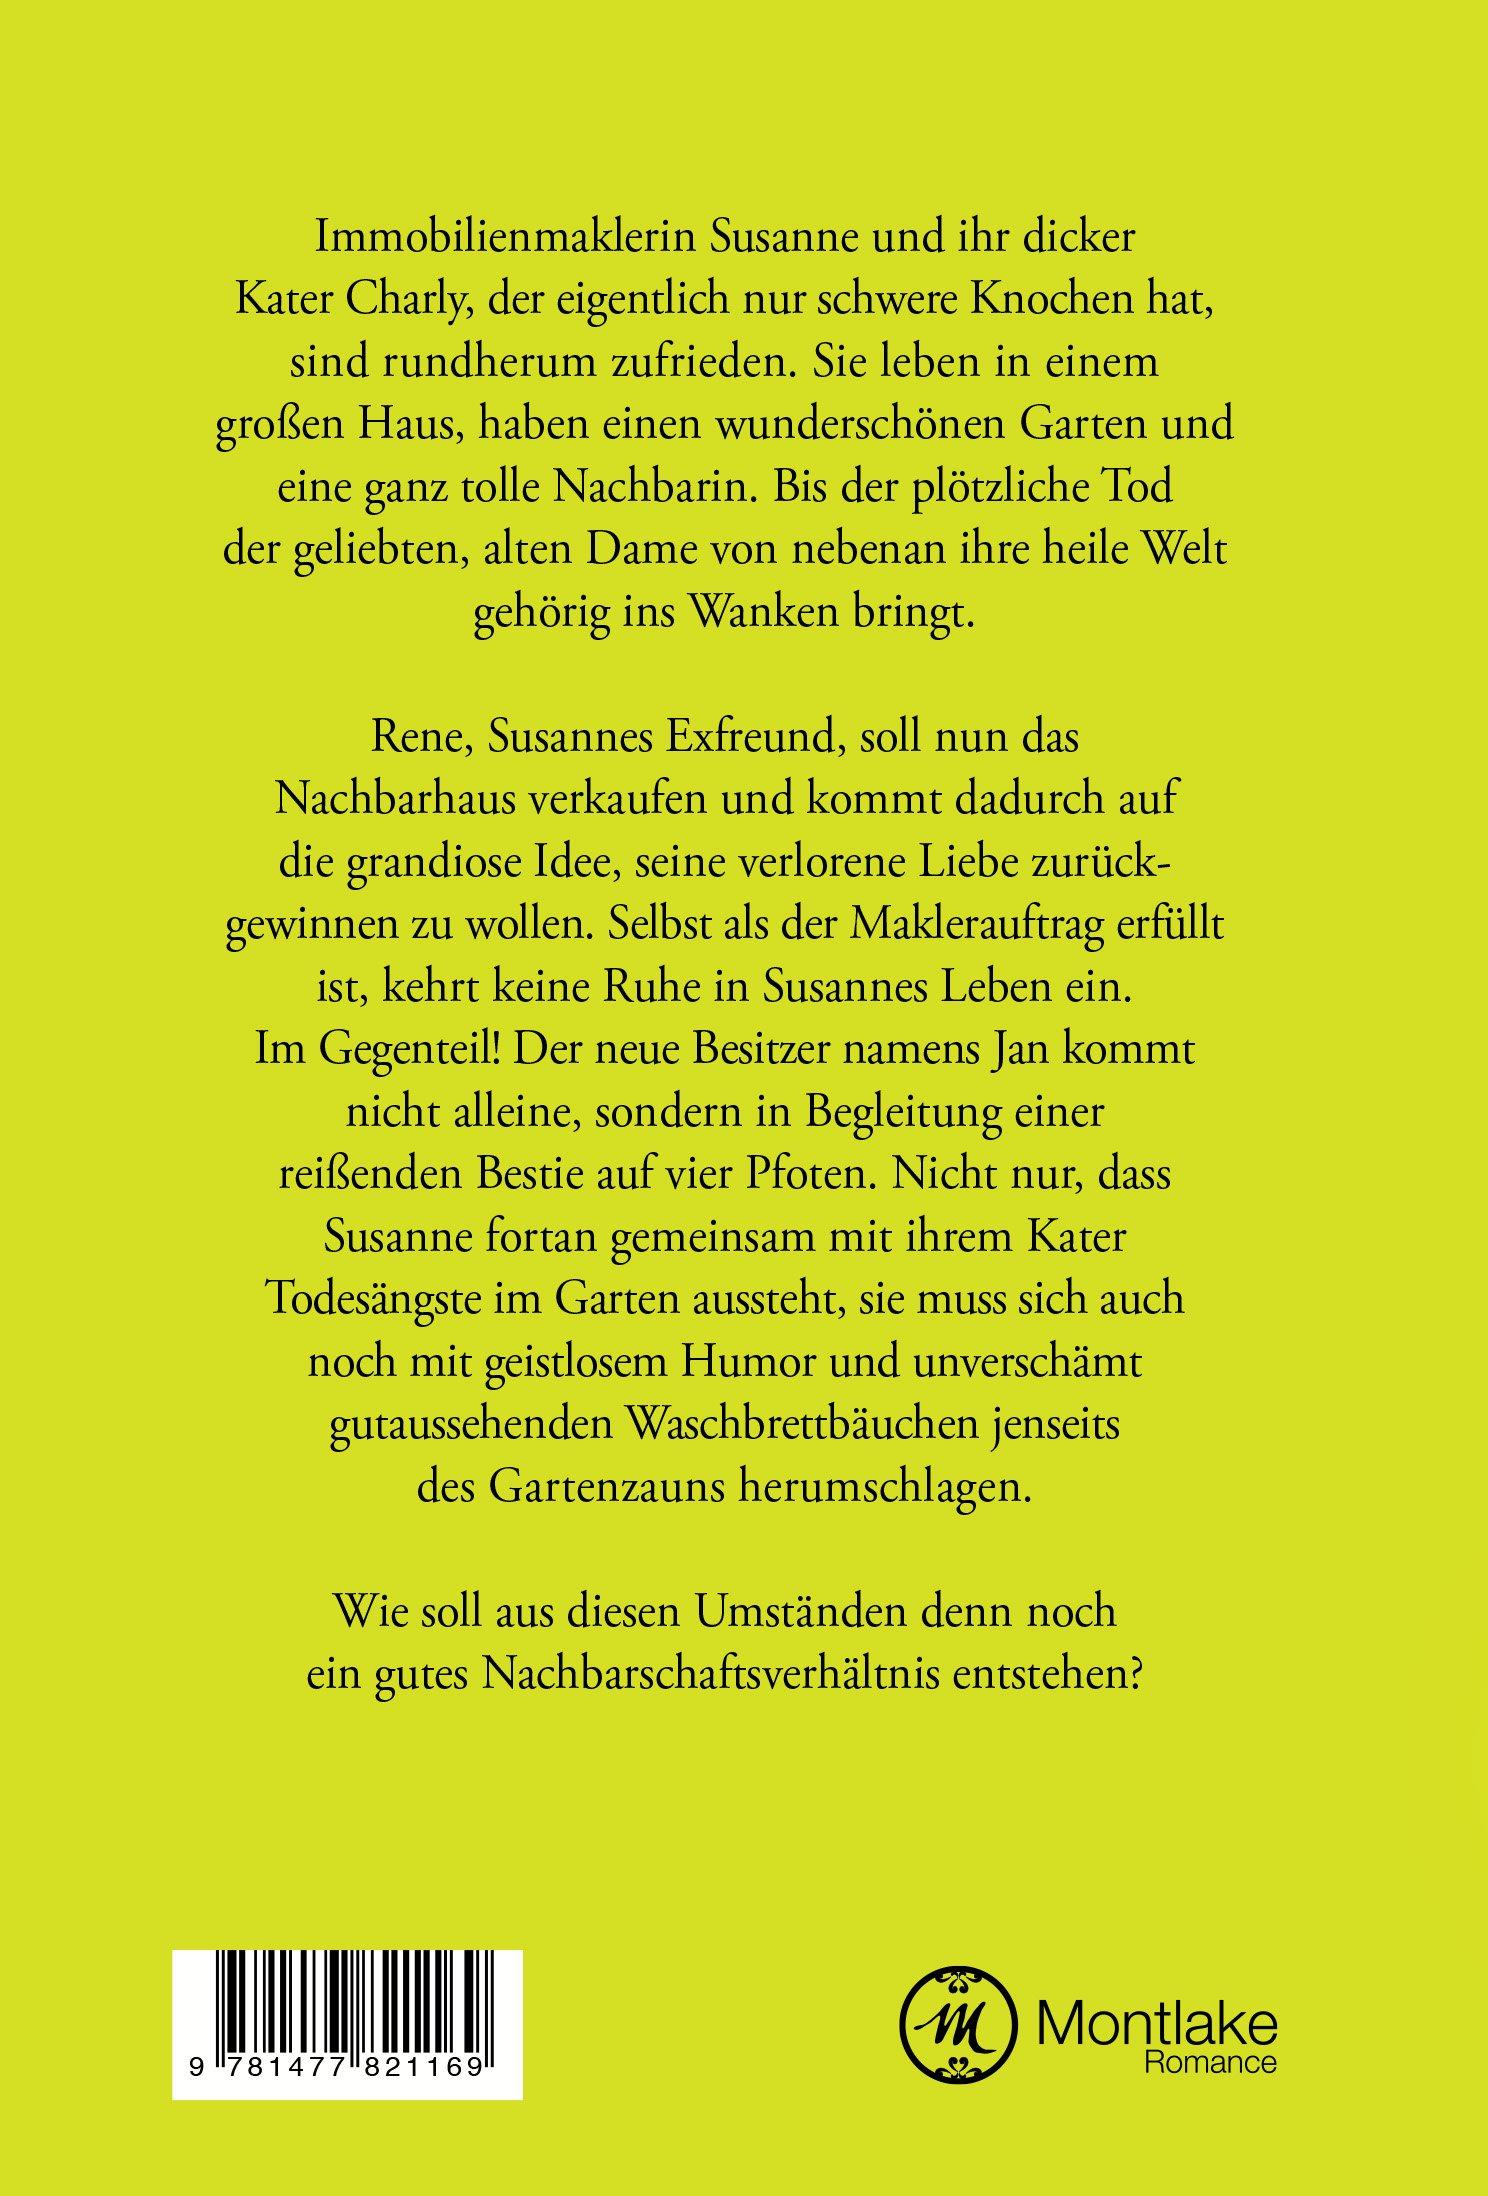 Nachbarschaftsverhältnis: Amazon.de: Johanna Danninger: Bücher